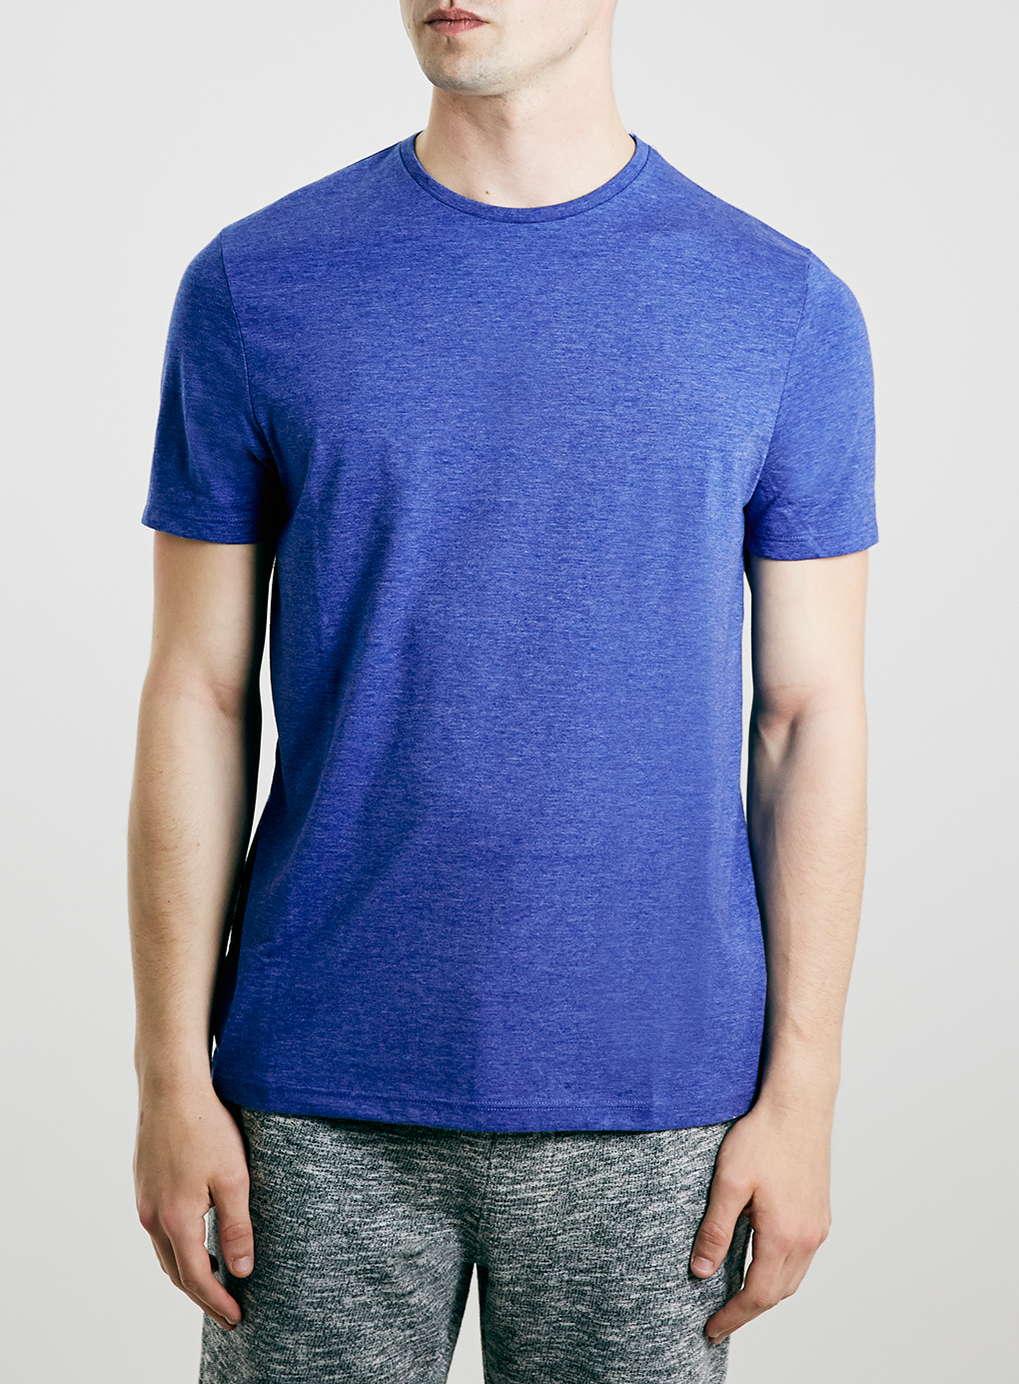 Topman ocean blue slim fit crew t shirt in blue for men lyst for Ocean blue t shirt